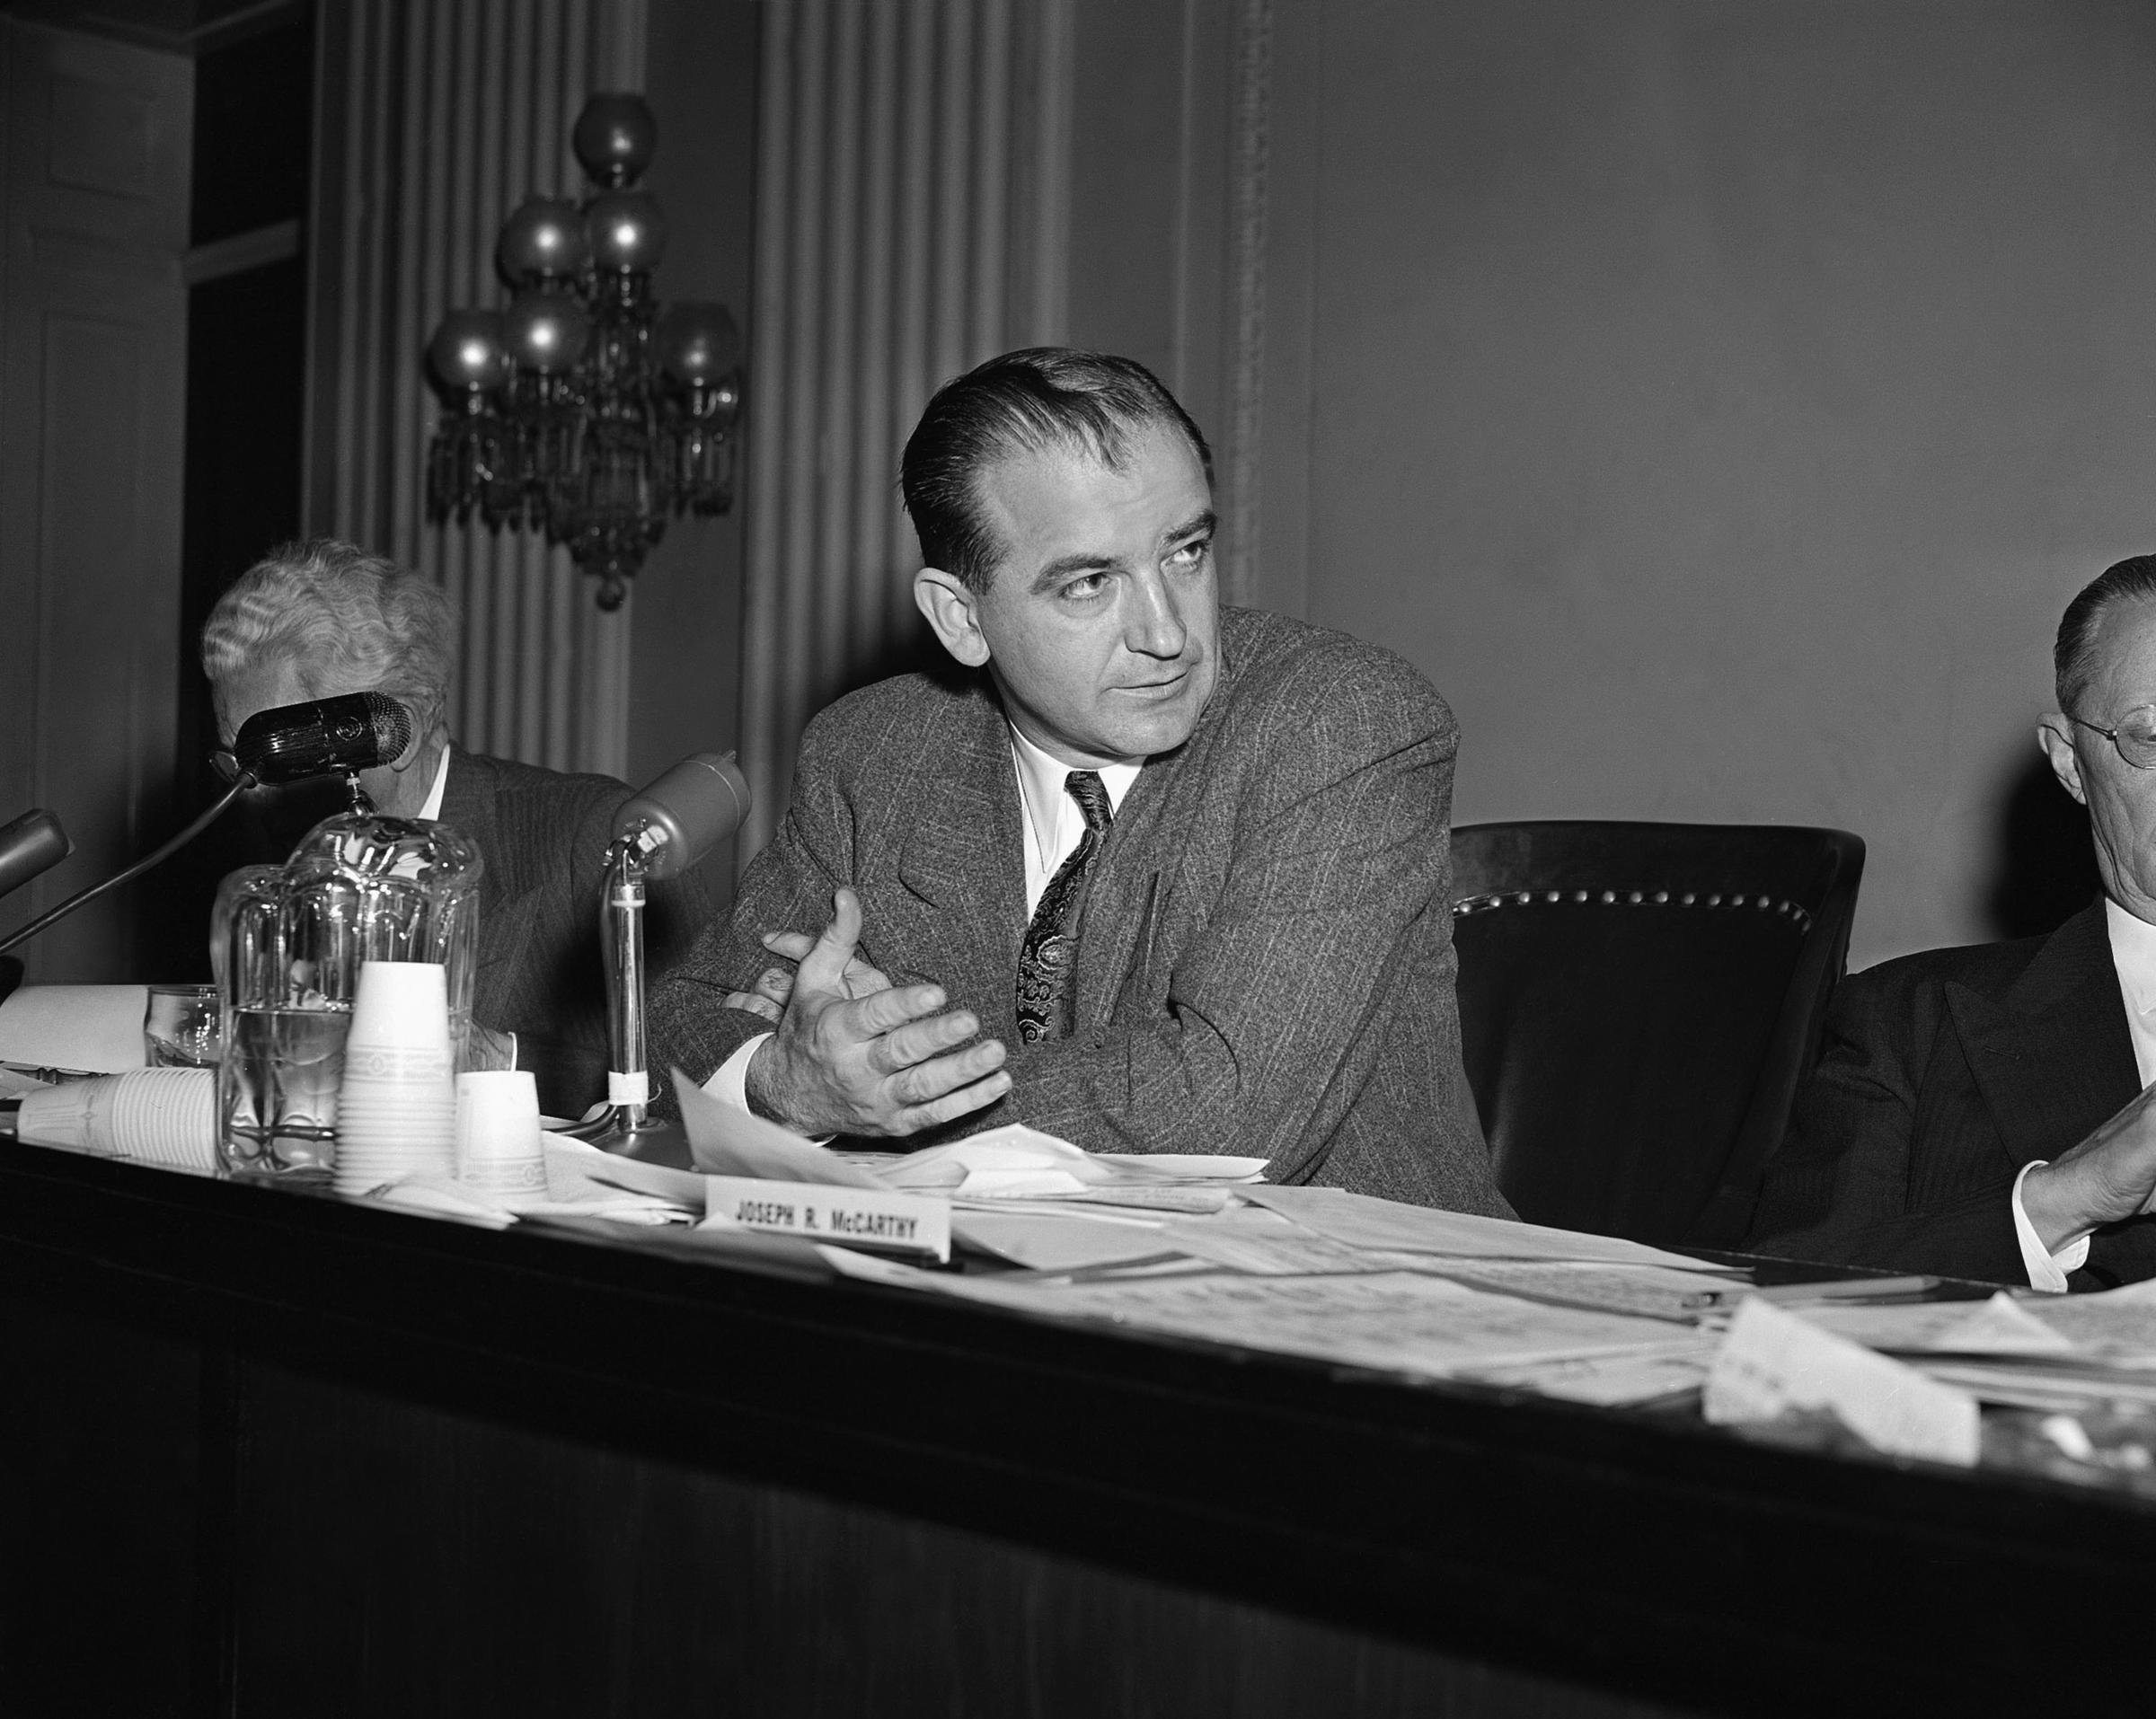 joseph mccarthy thesis Edgar f codd edgar ted codd born: edgar frank codd 19 august 1923 angered by senator joseph mccarthy, codd moved to ottawa his thesis was about self-replication in cellular automata.